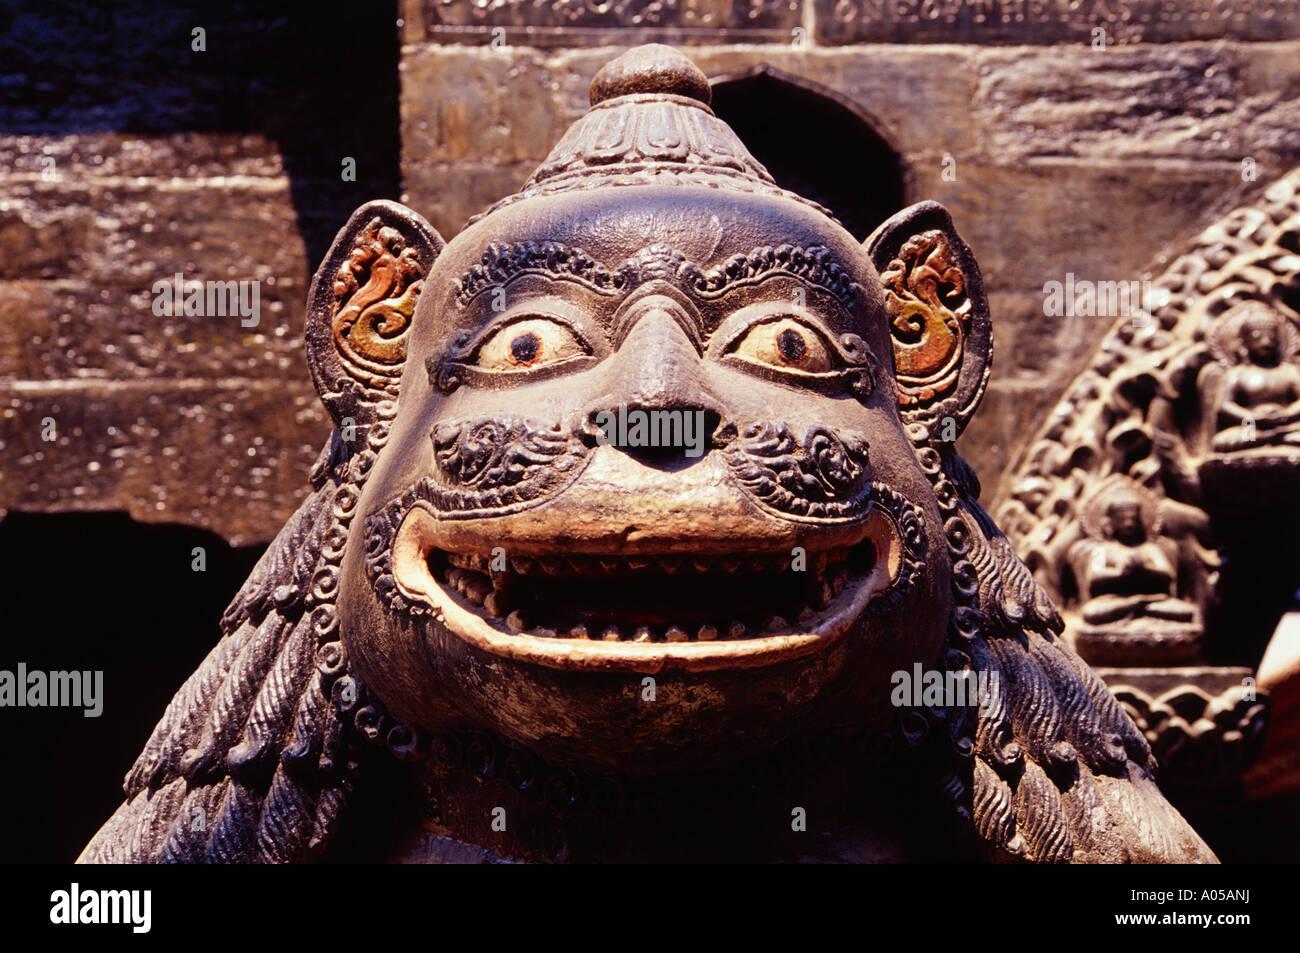 Patan, Golden Temple, Guardian Lion - Stock Image